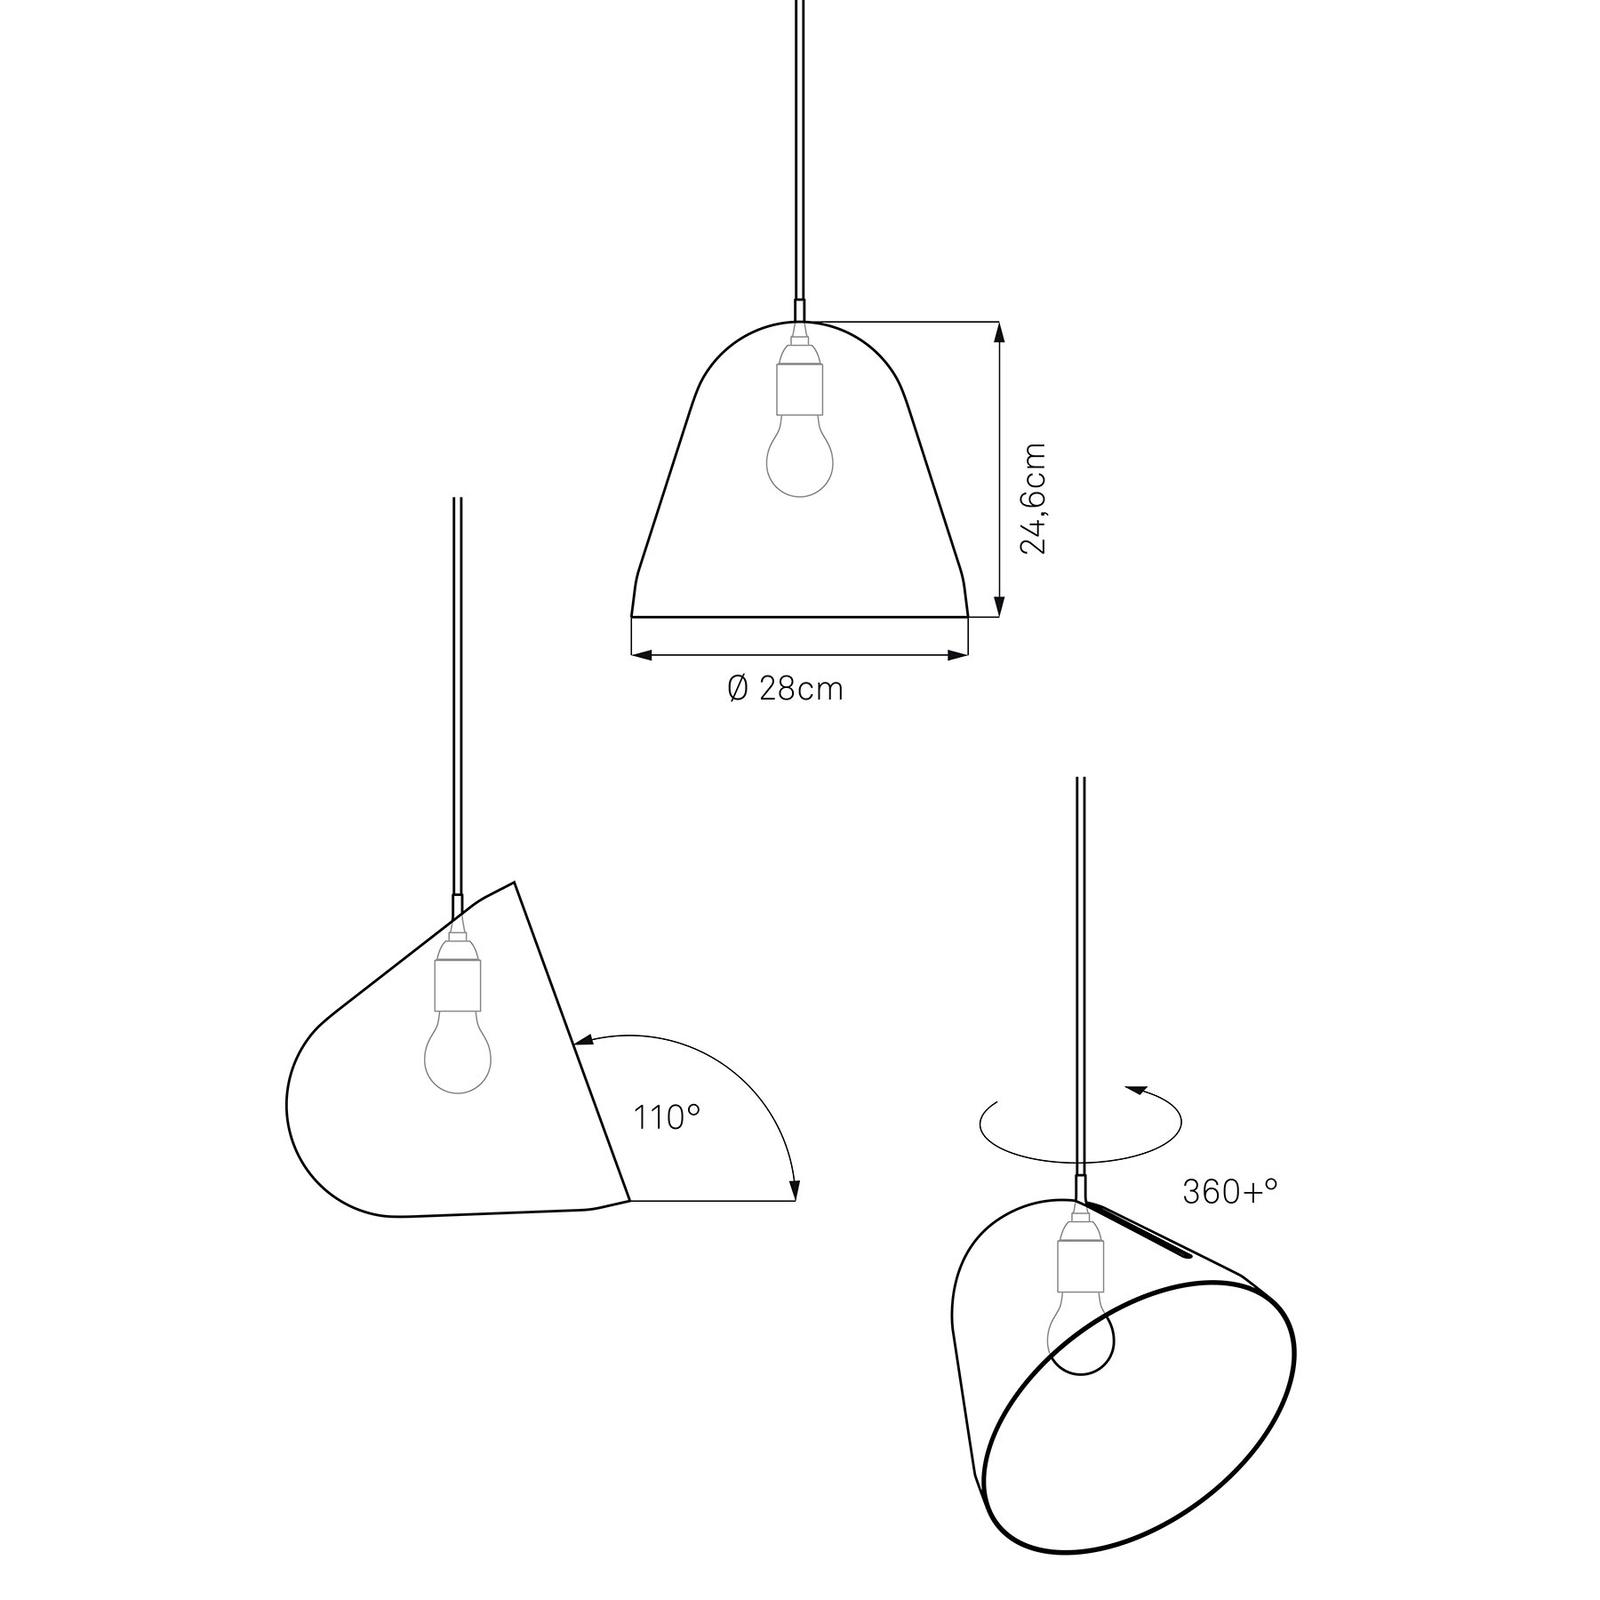 Nyta Tilt hanglamp, kabel 3m rood, zwart